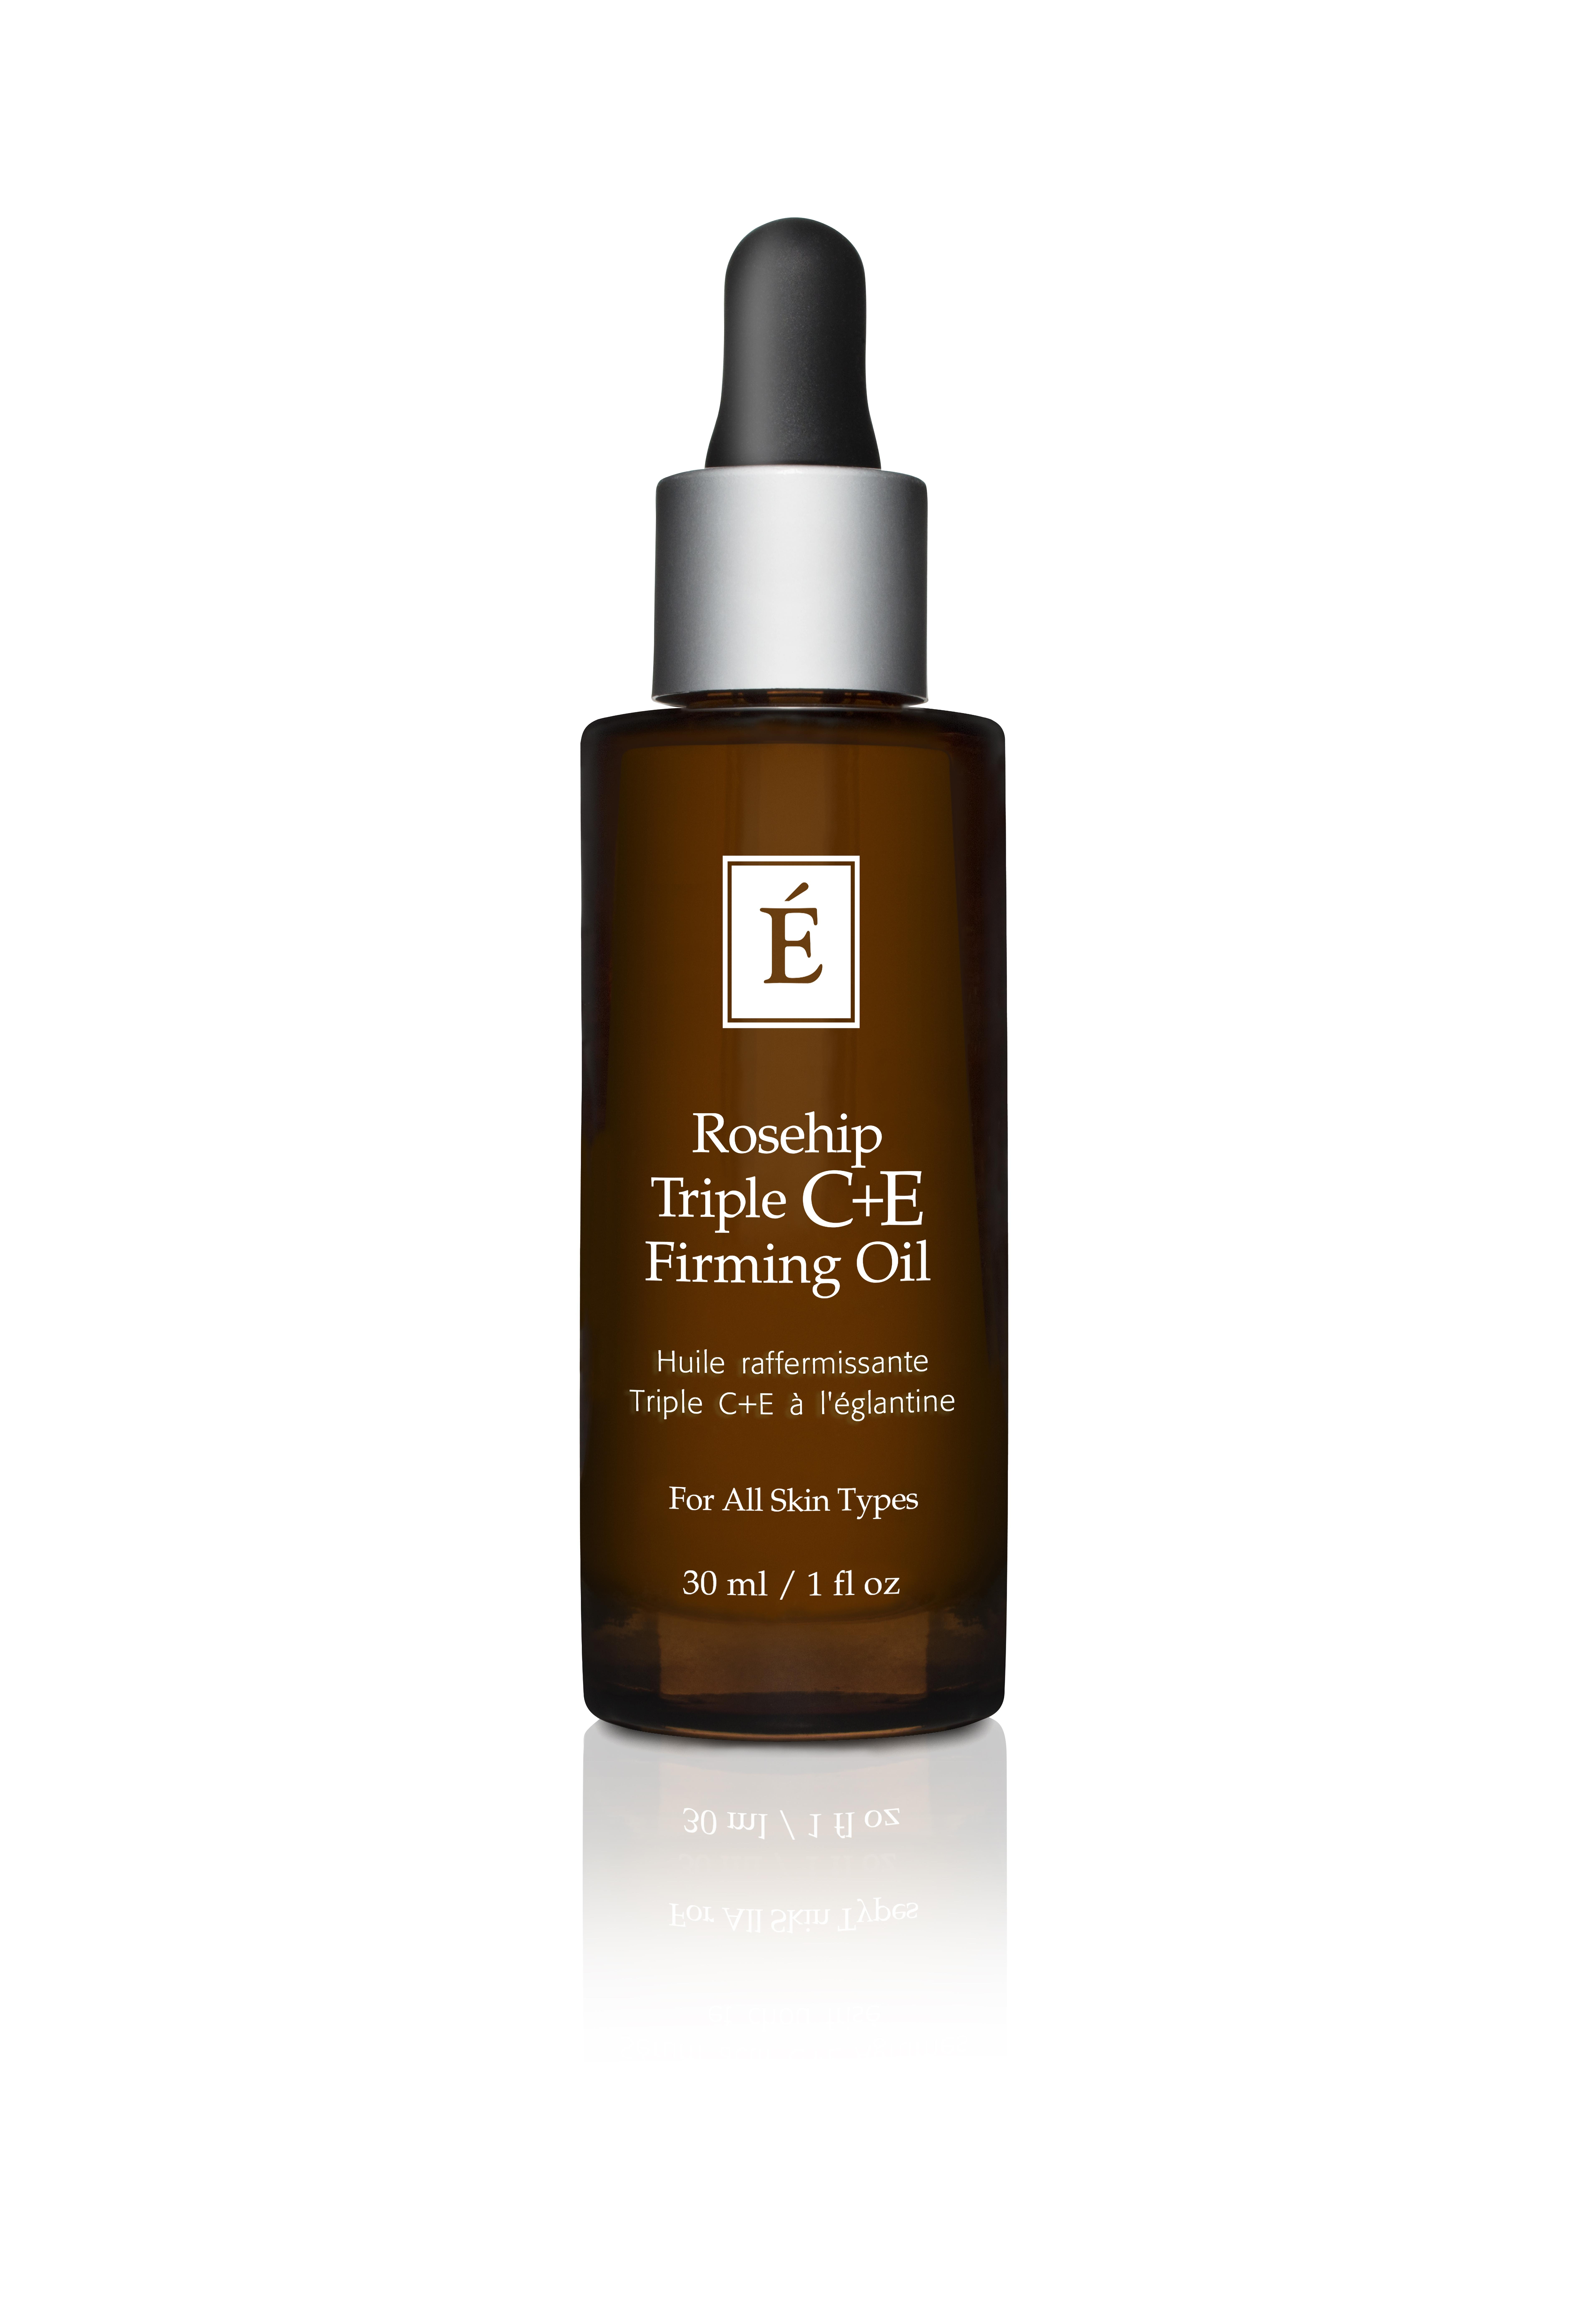 Eminence Rosehip Triple C + E Firming Oil